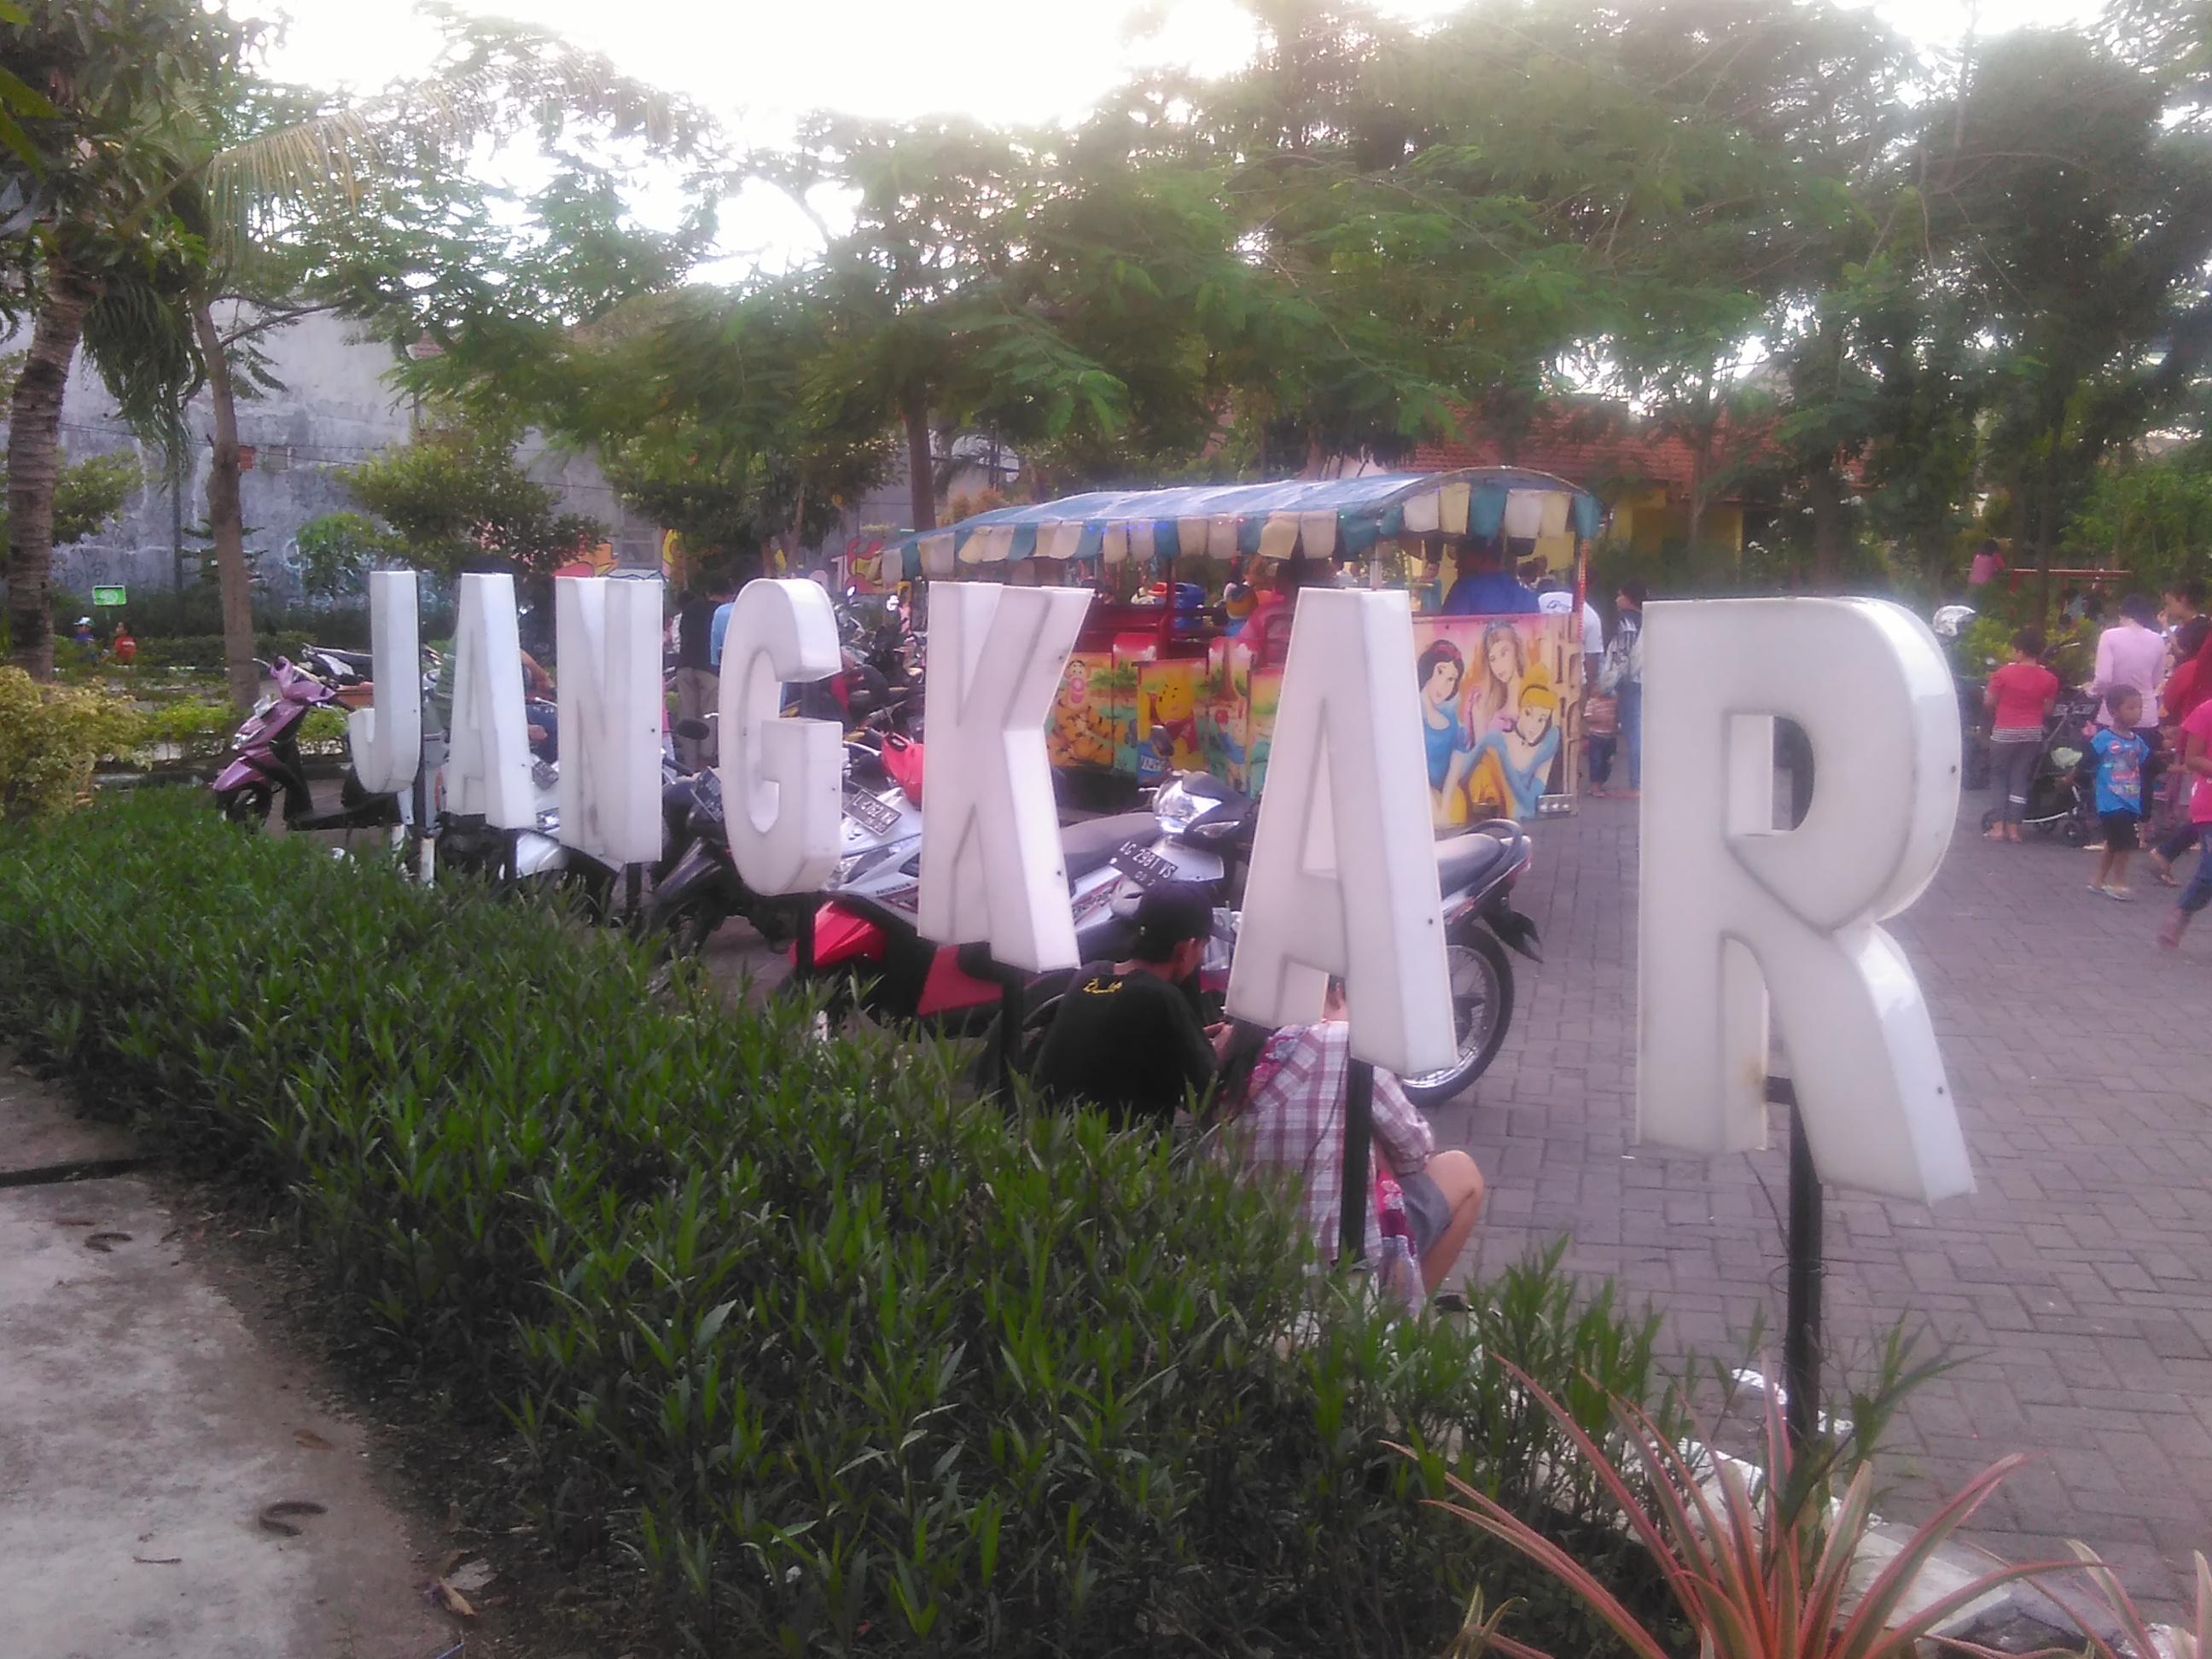 Pesona Taman Kota Surabaya Jangkar Buah Undaan